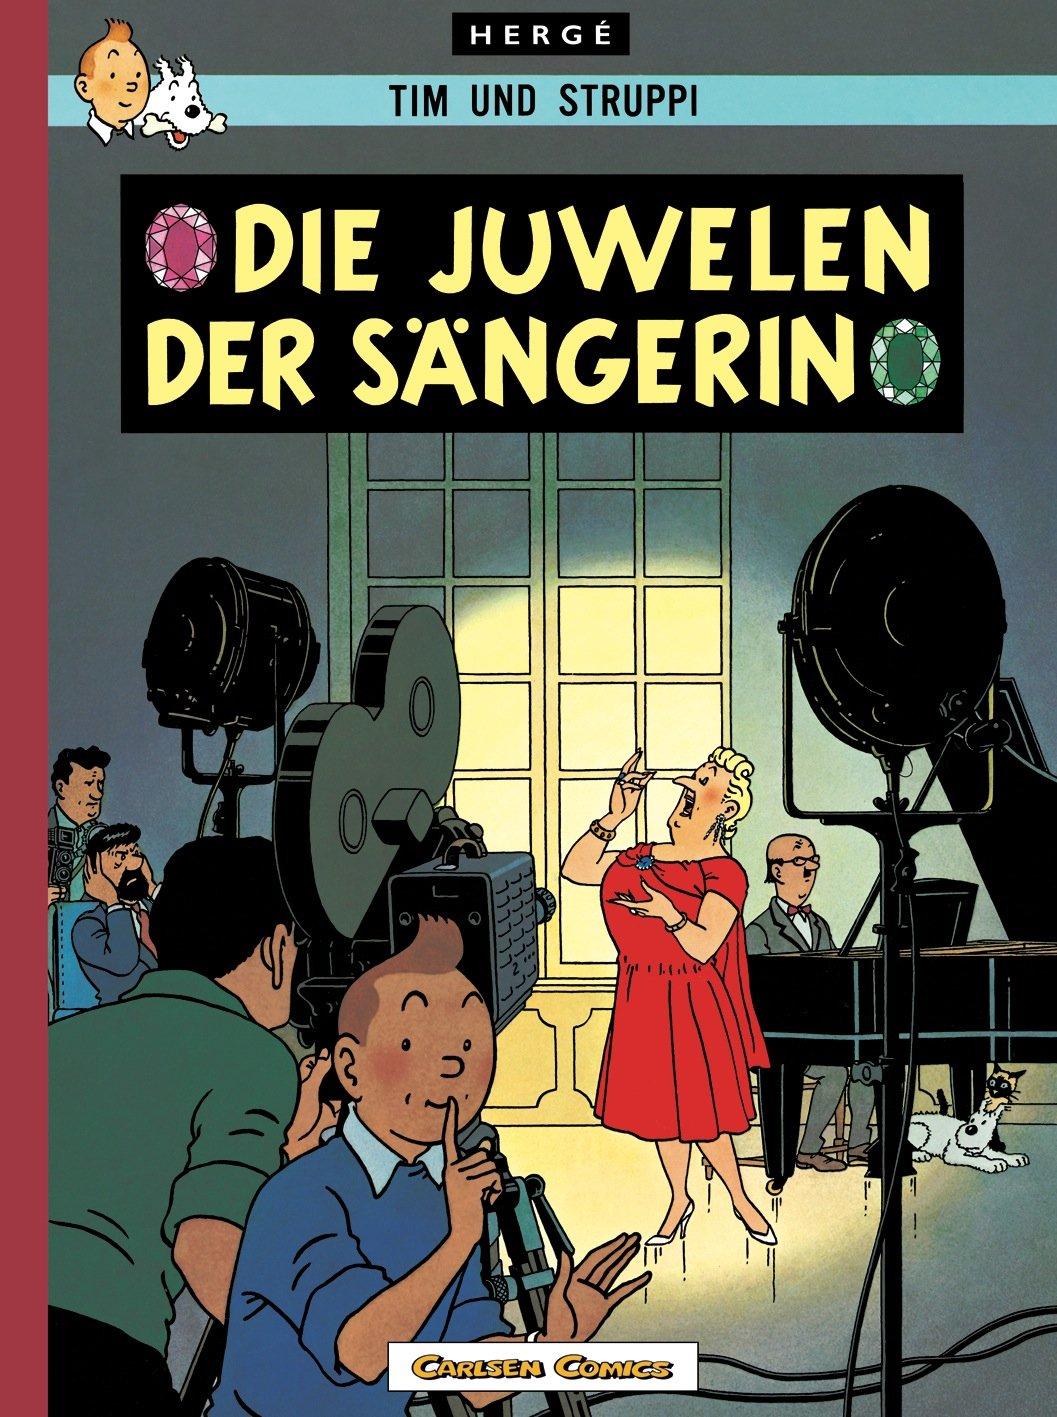 Tim & Struppi Farbfaksimile, Band 20: Die Juwelen der Sängerin Gebundenes Buch – 30. September 2011 Hergé Carlsen 3551738491 Comic